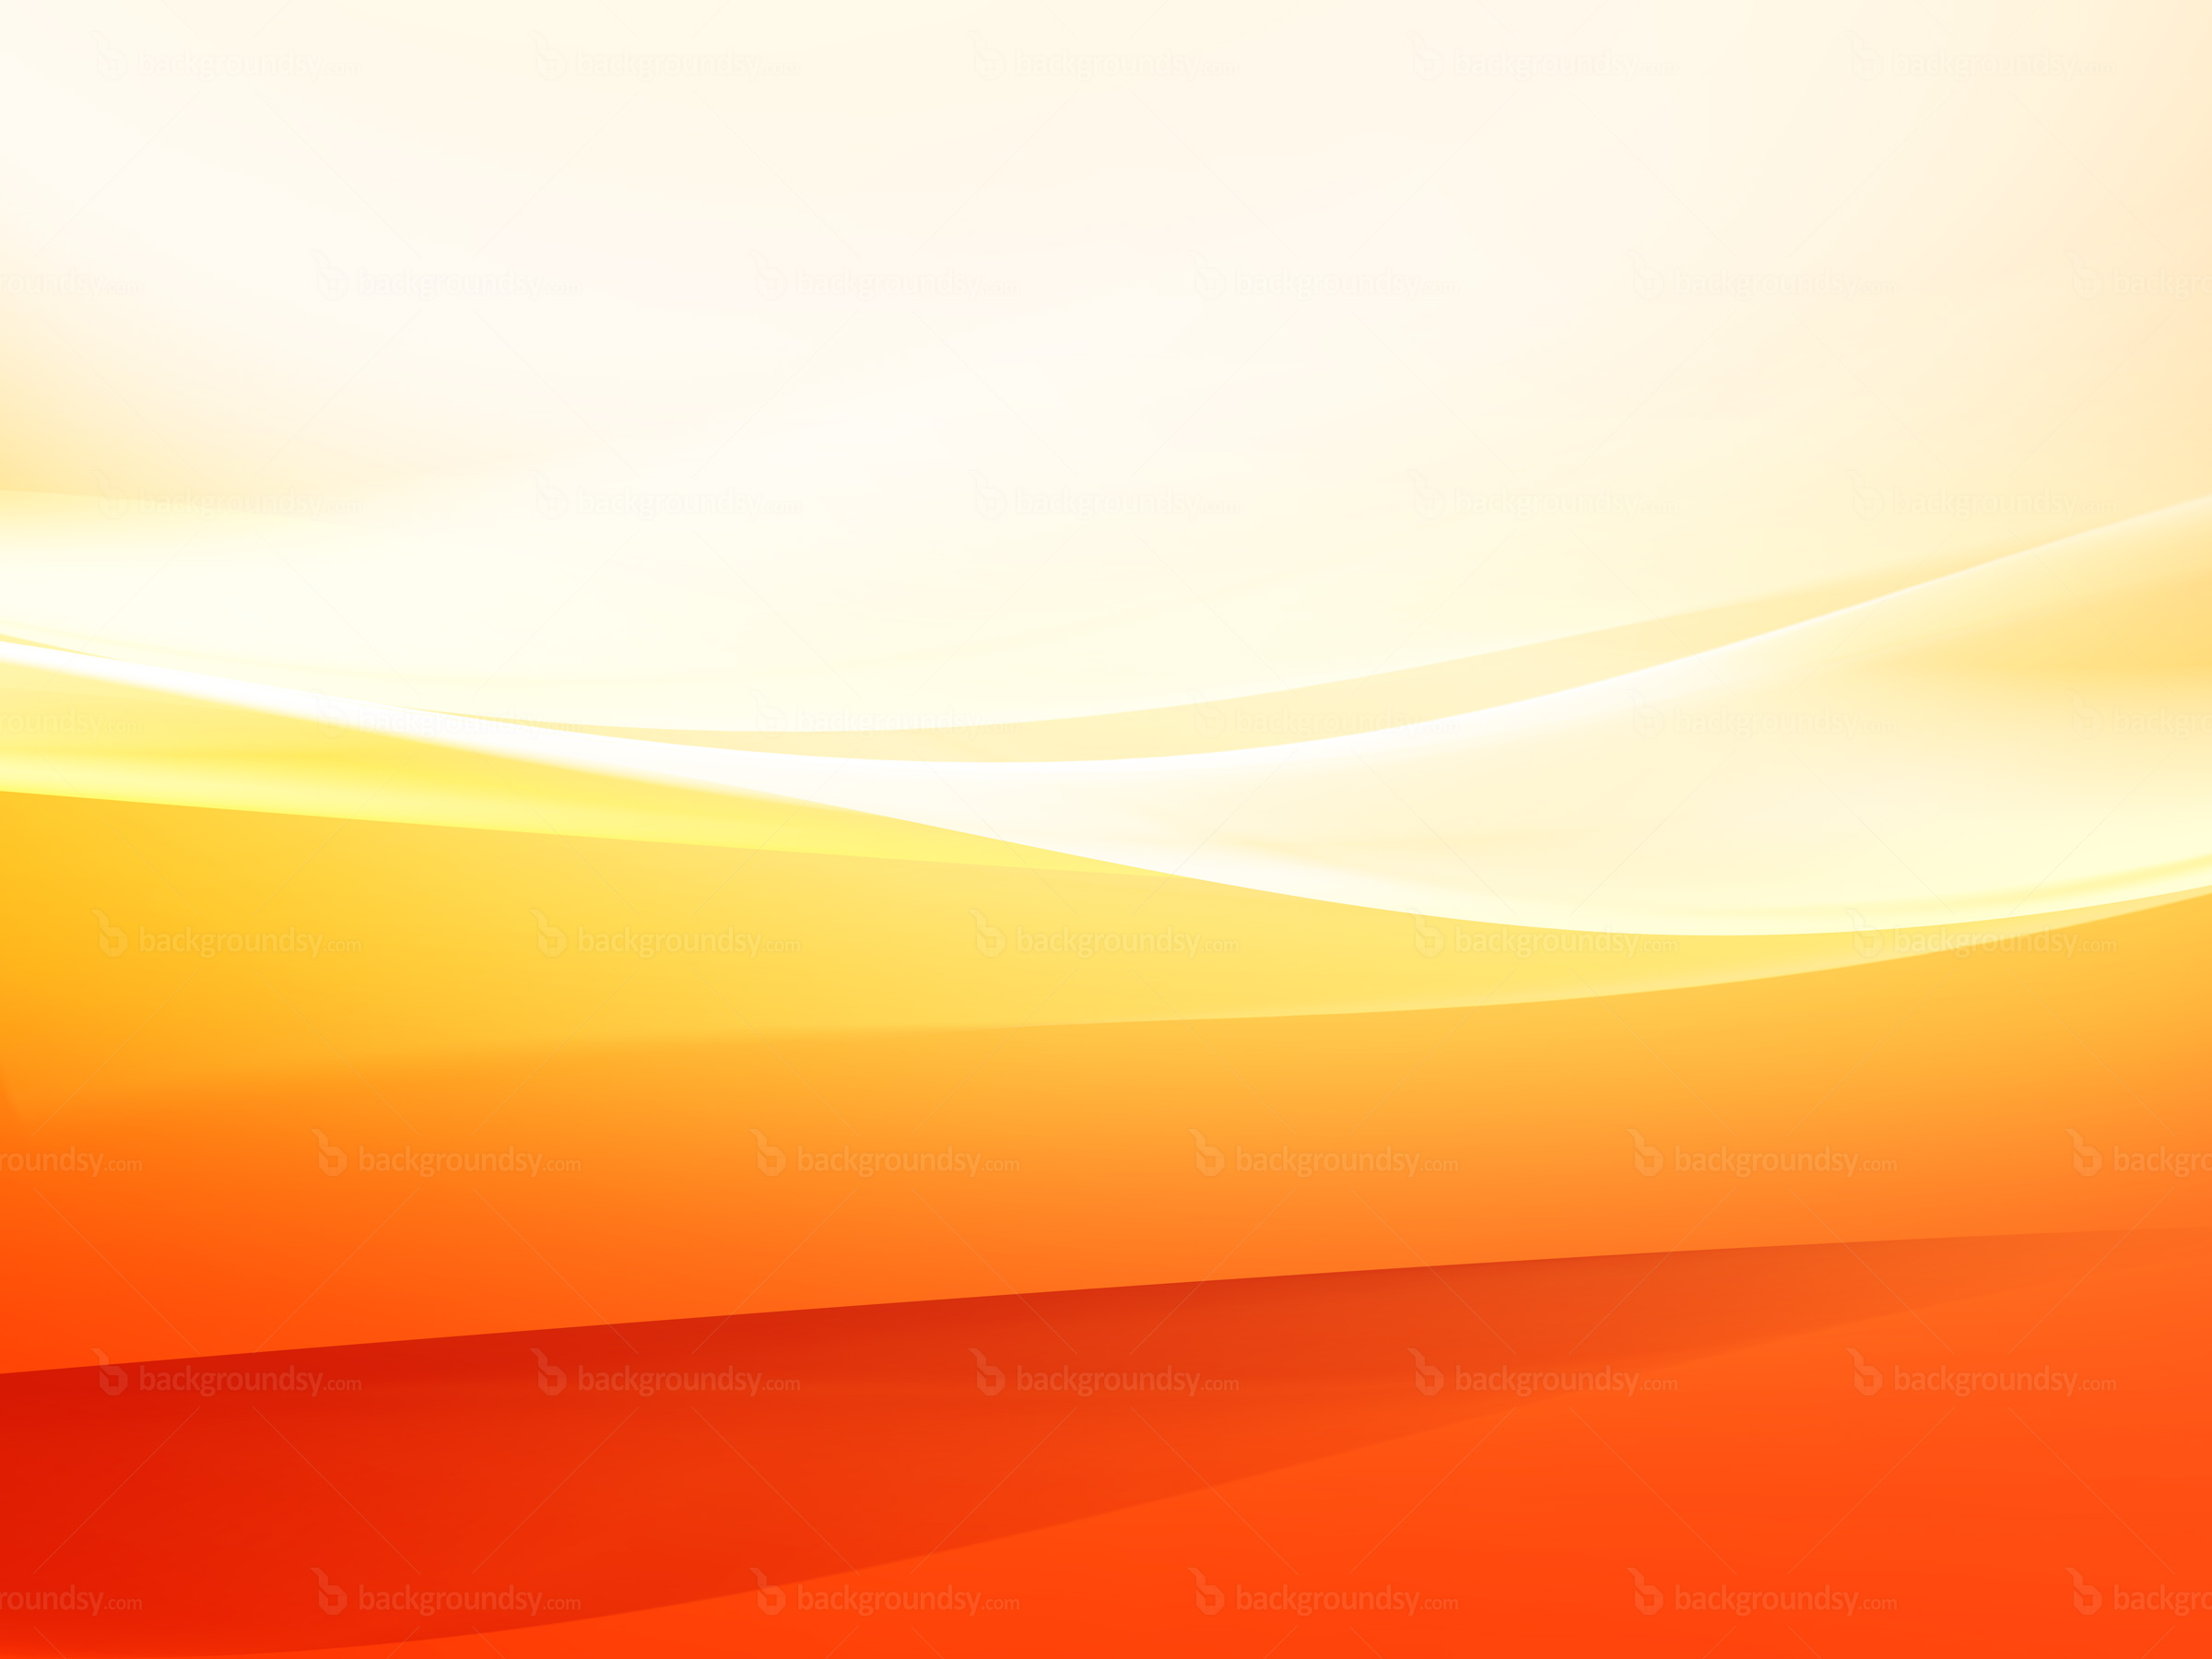 Warm colors background Backgroundsycom 2400x1800